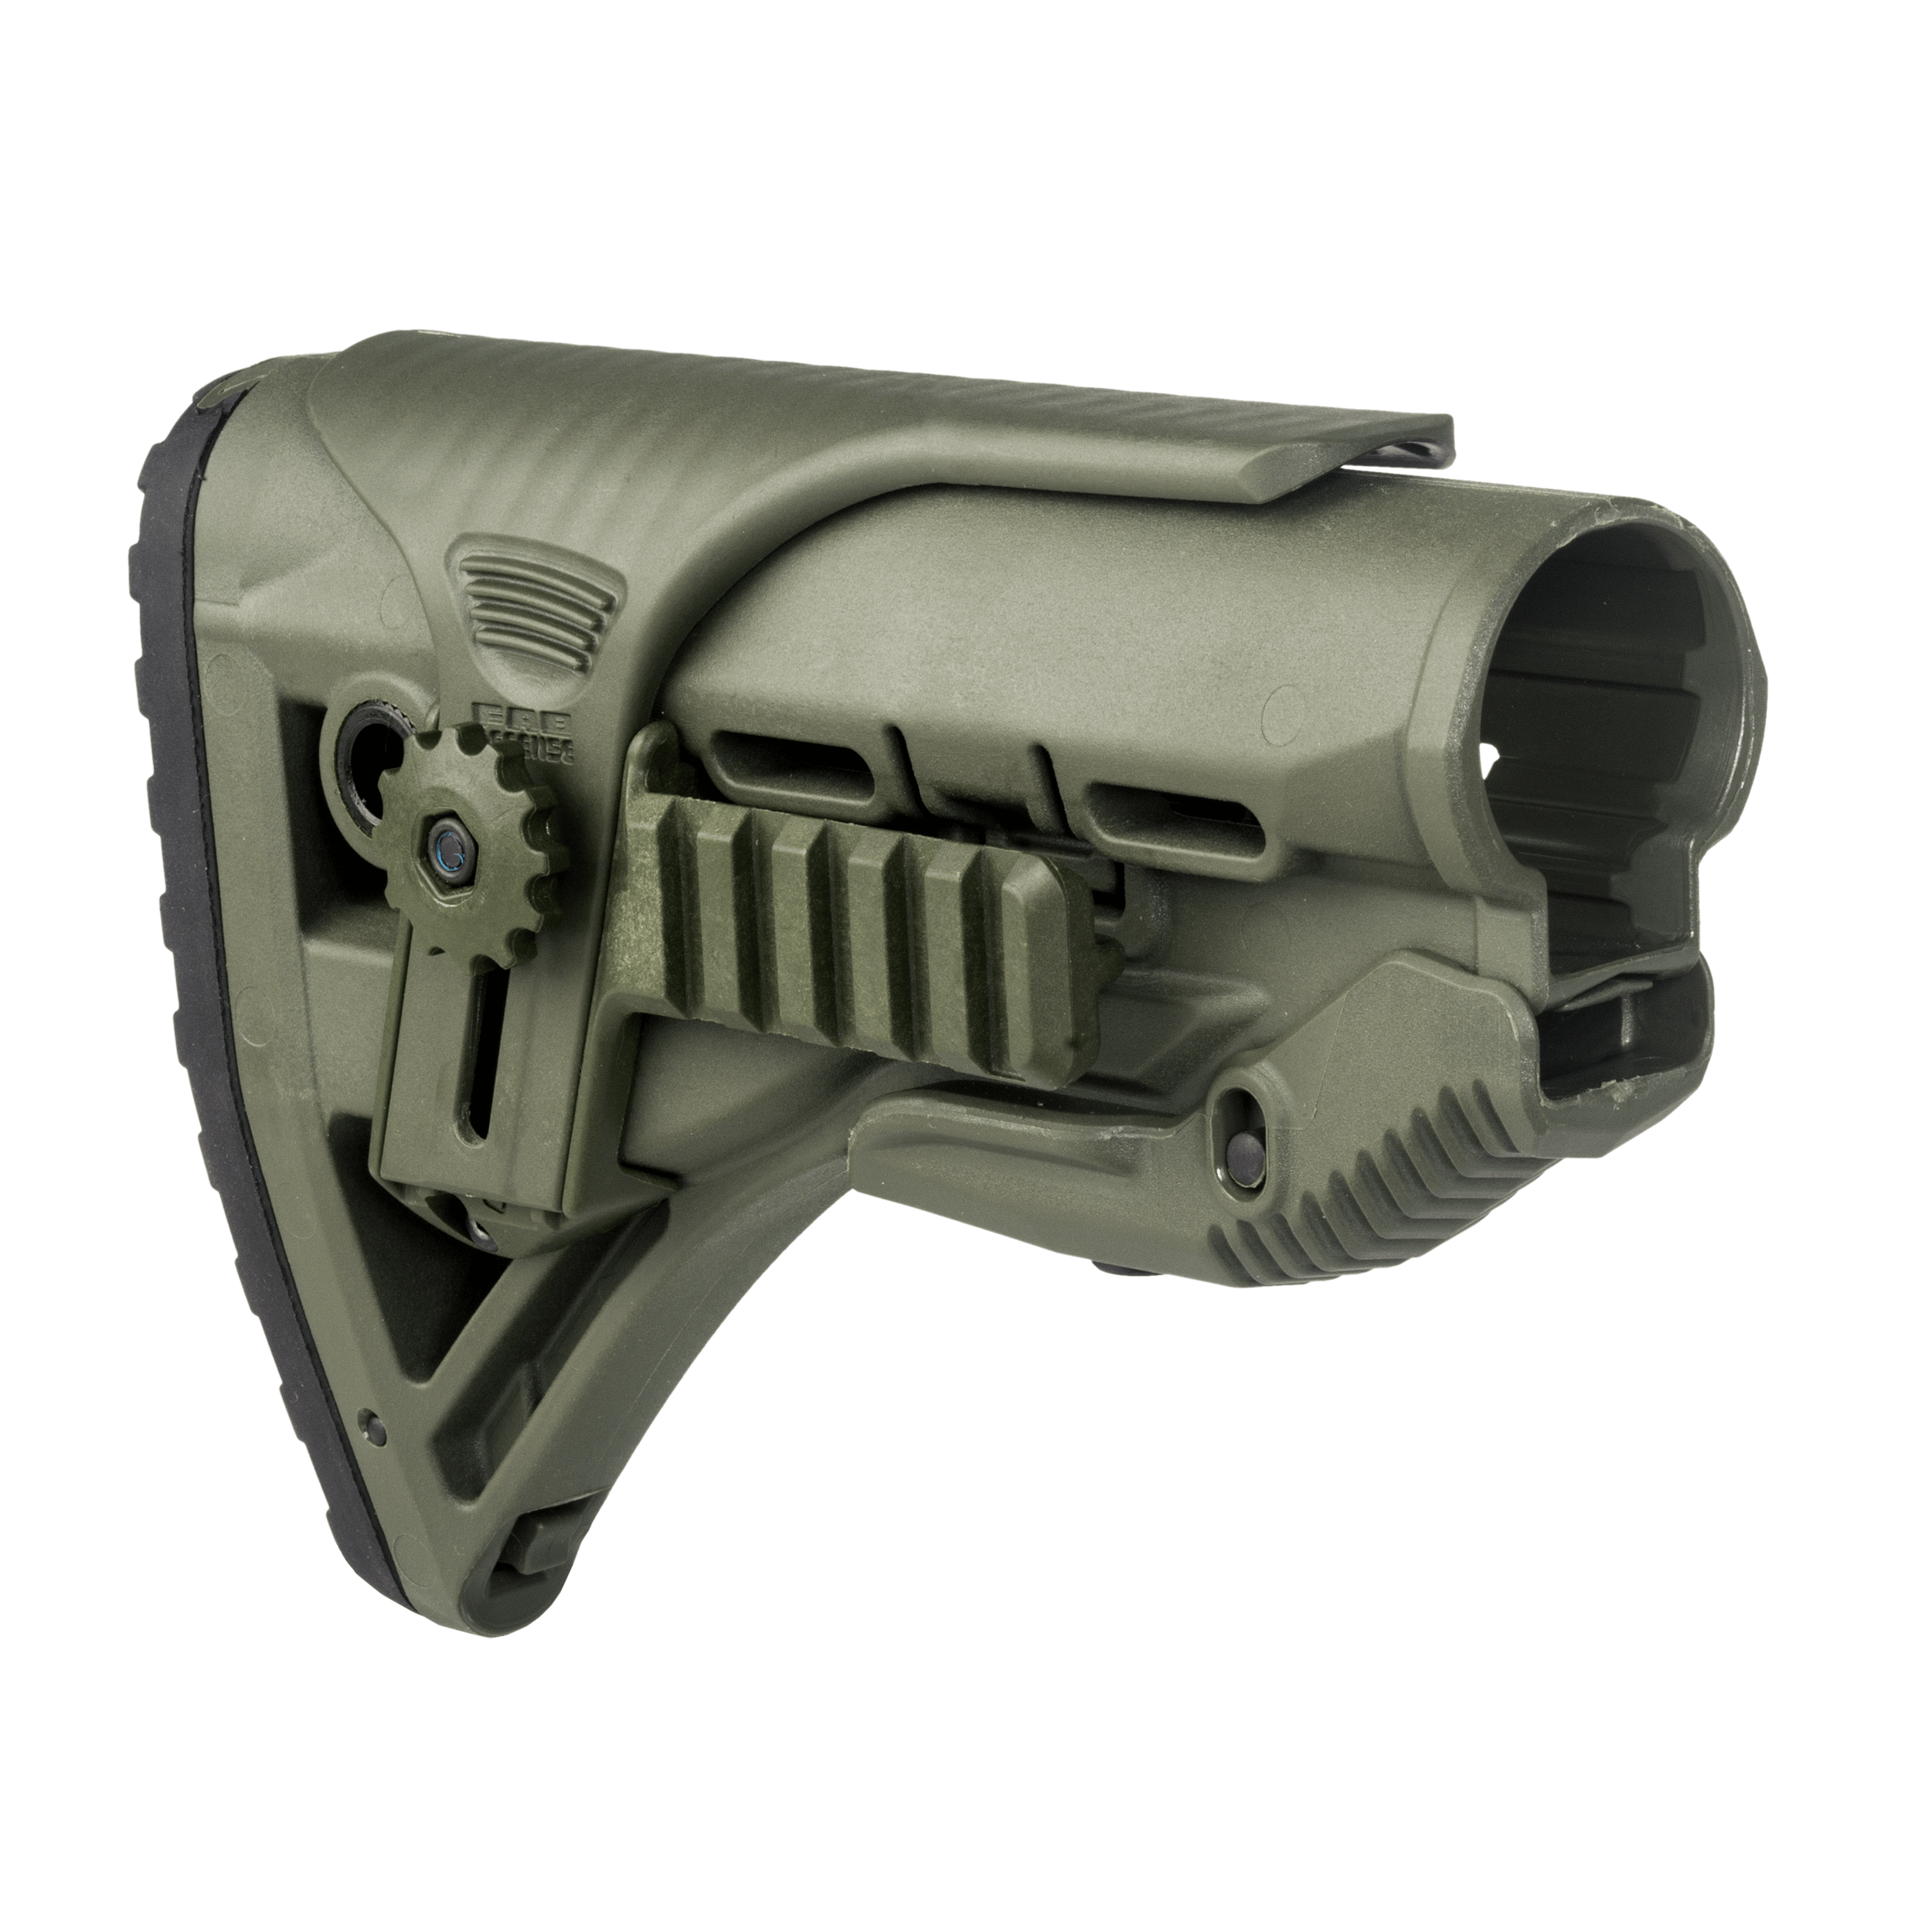 Buttstock AR15 / M16 / M4 Style - Shock Absorbing / Rail